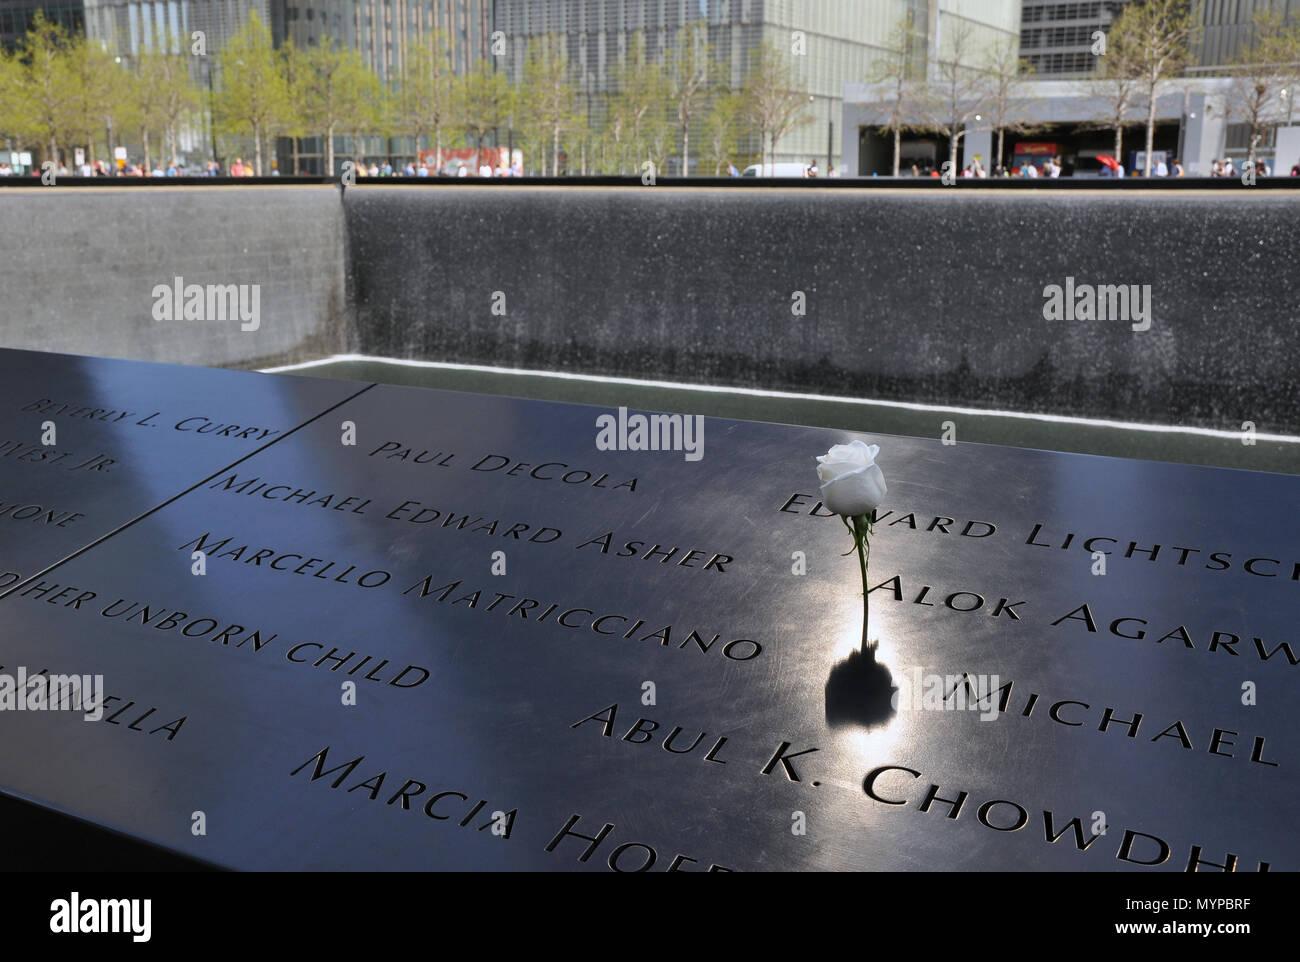 World Trade Center memorial - Stock Image